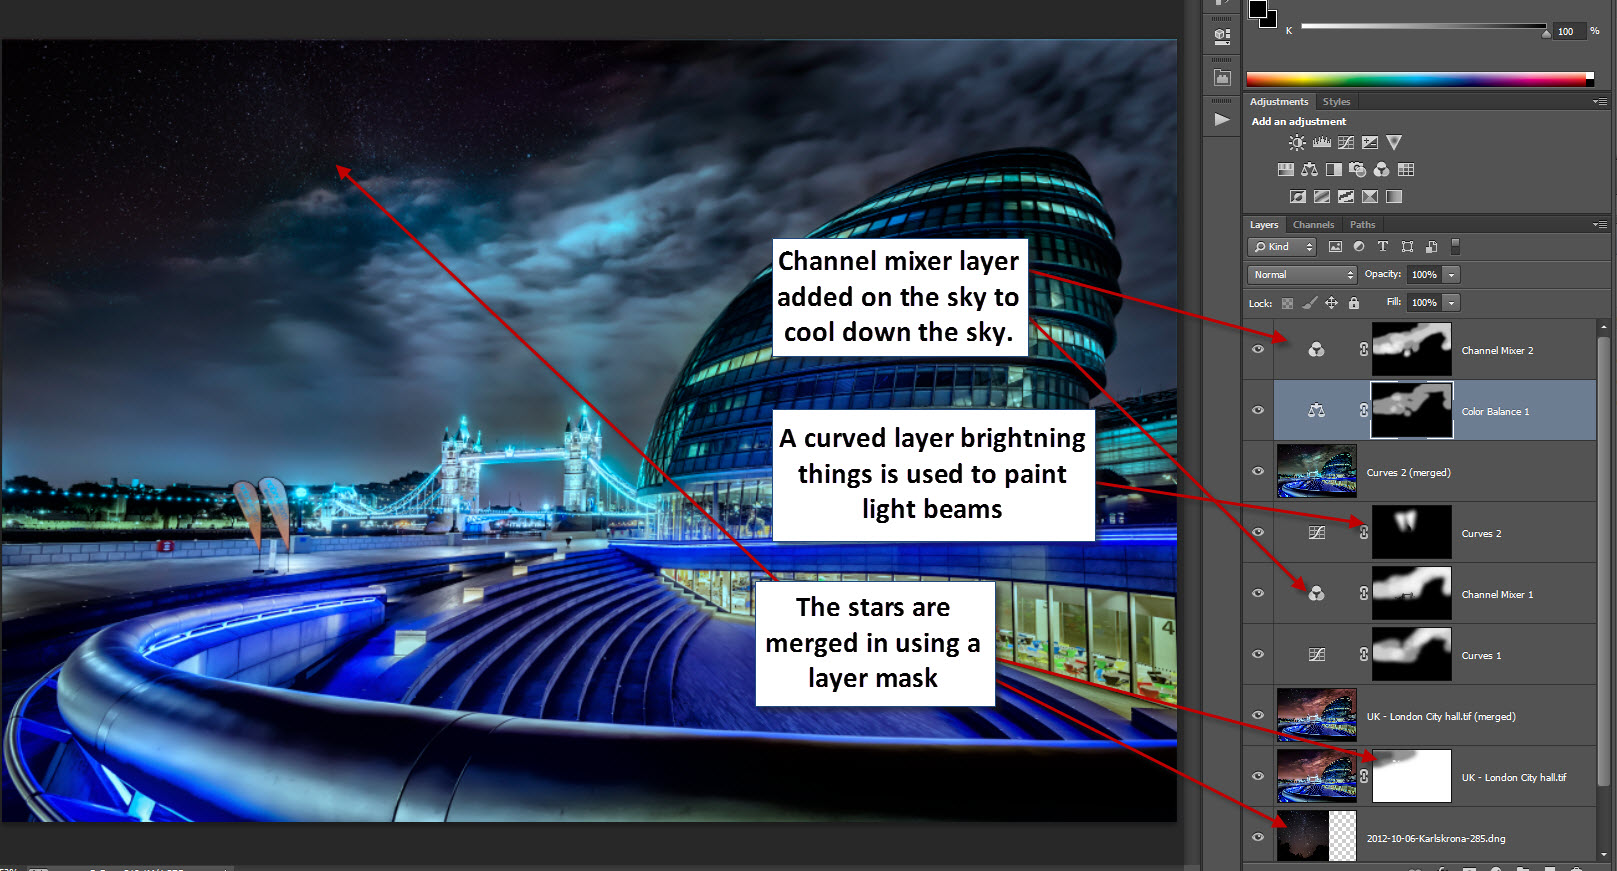 UK - City hall and london tower bridge step 2